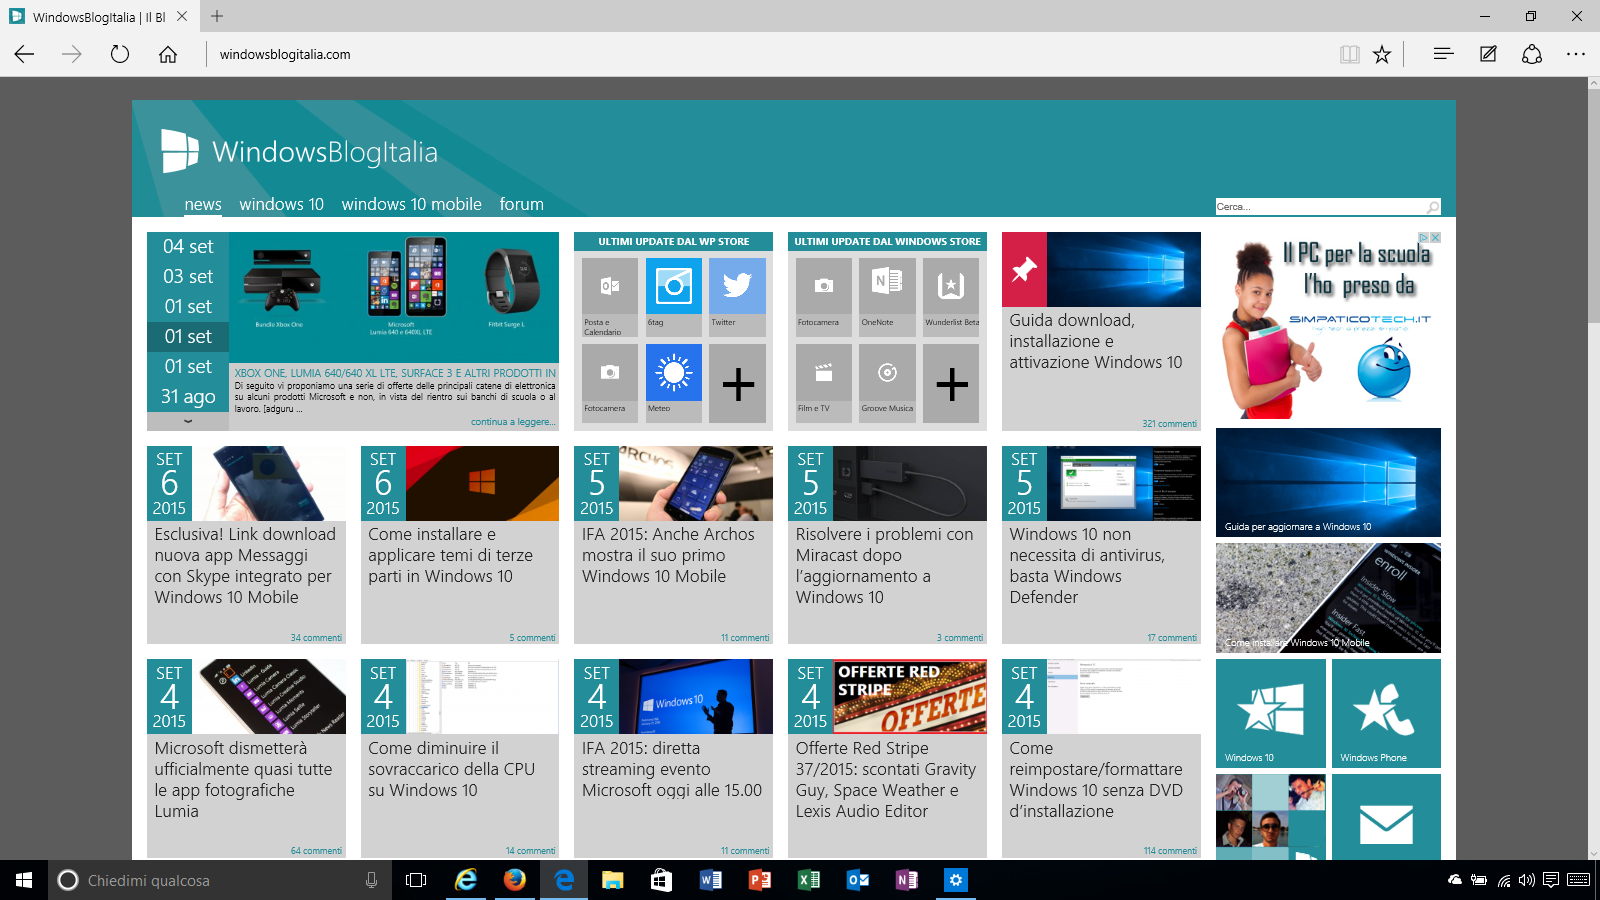 MicrosoftEdge-1